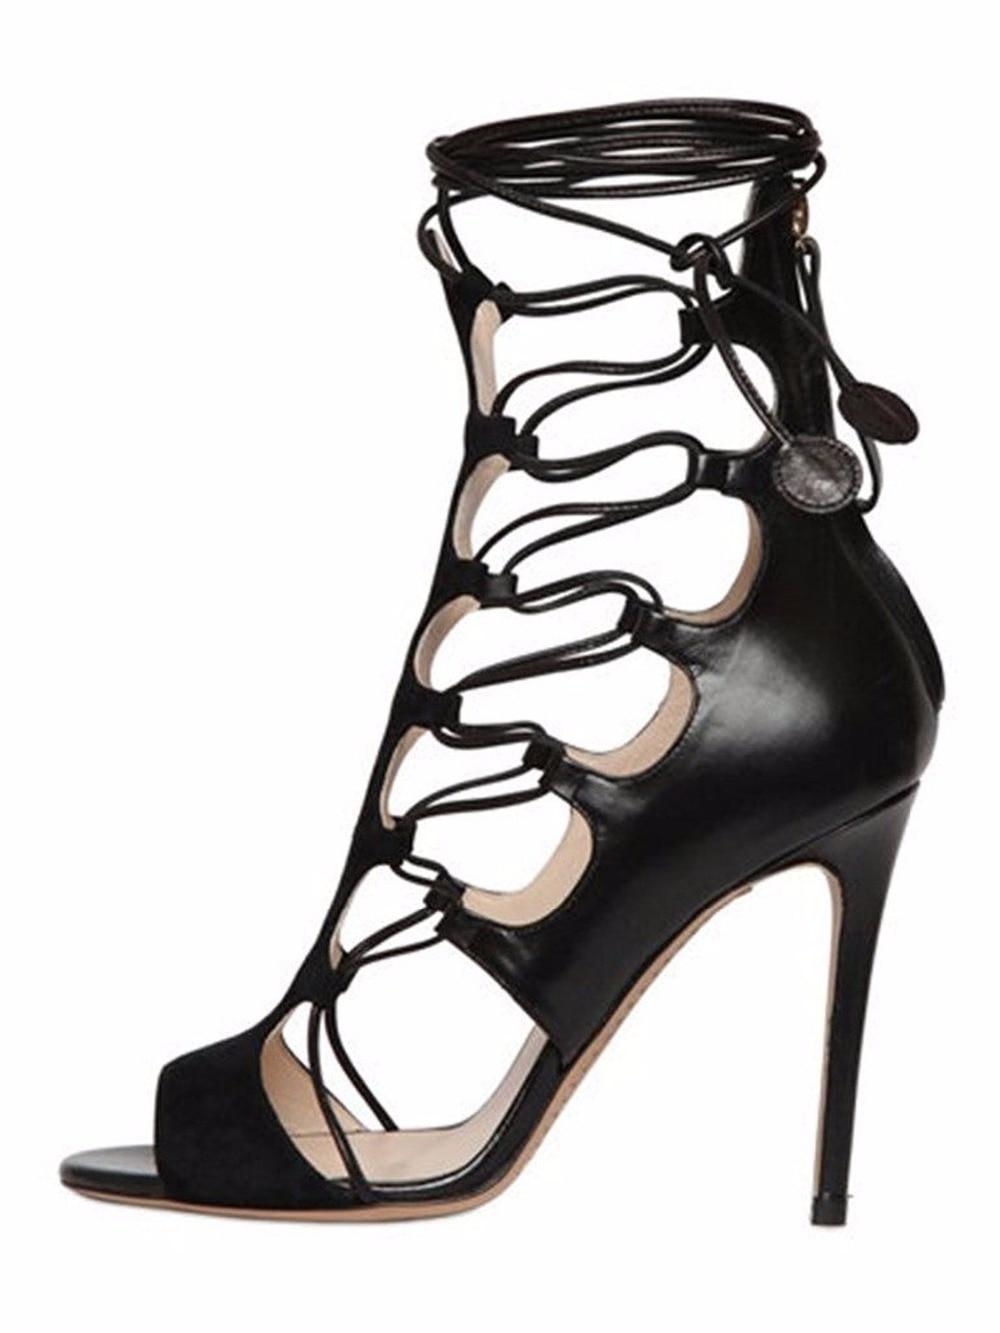 Inisastyle Stiletto High heel solid Women's Shoe lace up peep toe cross-tied sandalia backstrap cutouts rome pumps big size 4-15